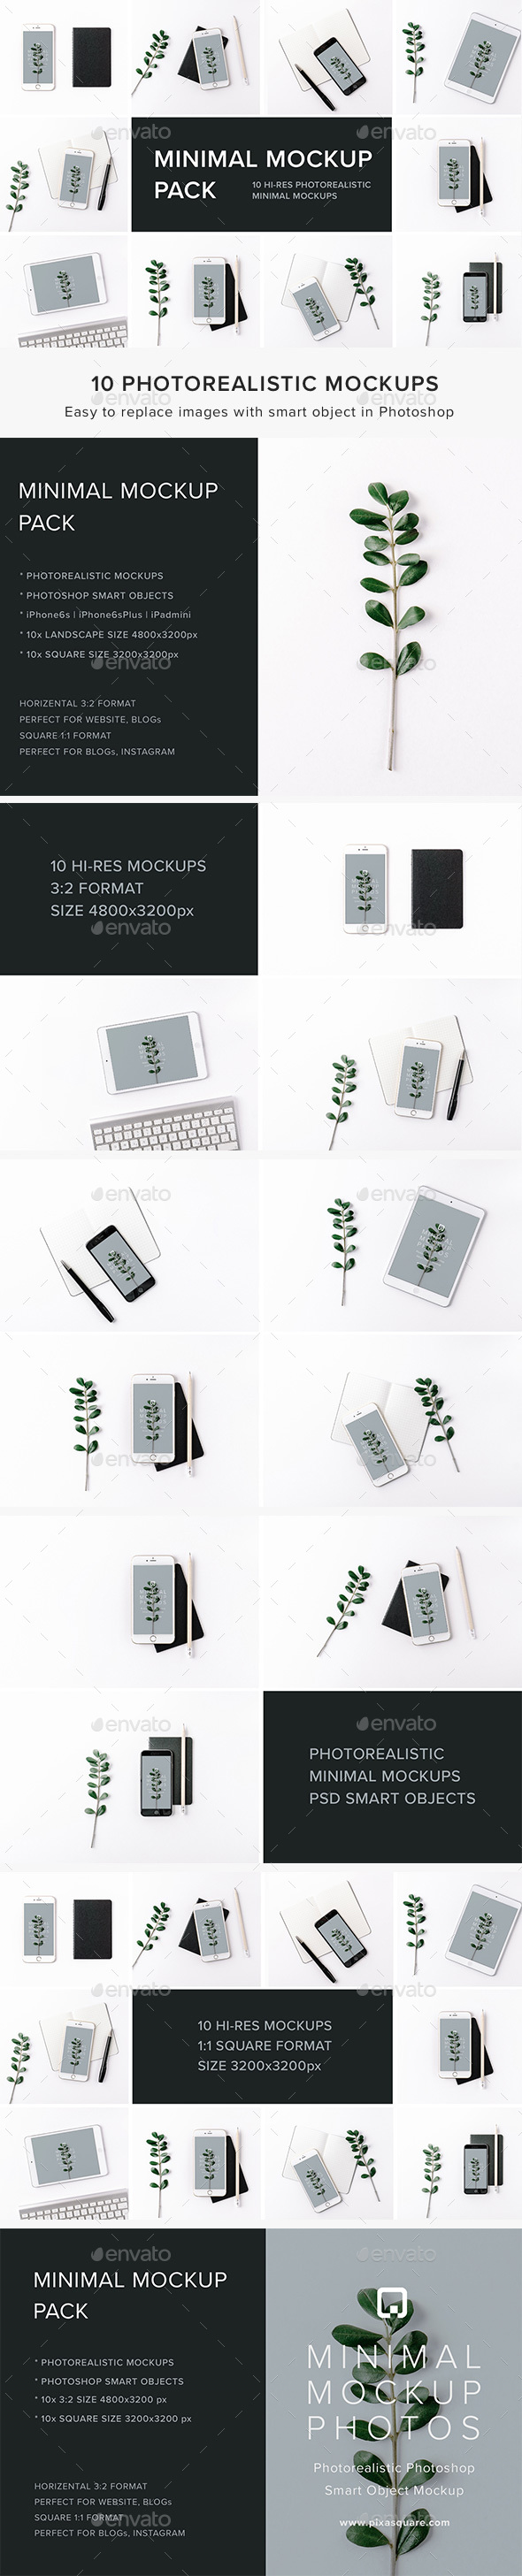 Minimal Mockup Pack Photorealistic - Product Mock-Ups Graphics